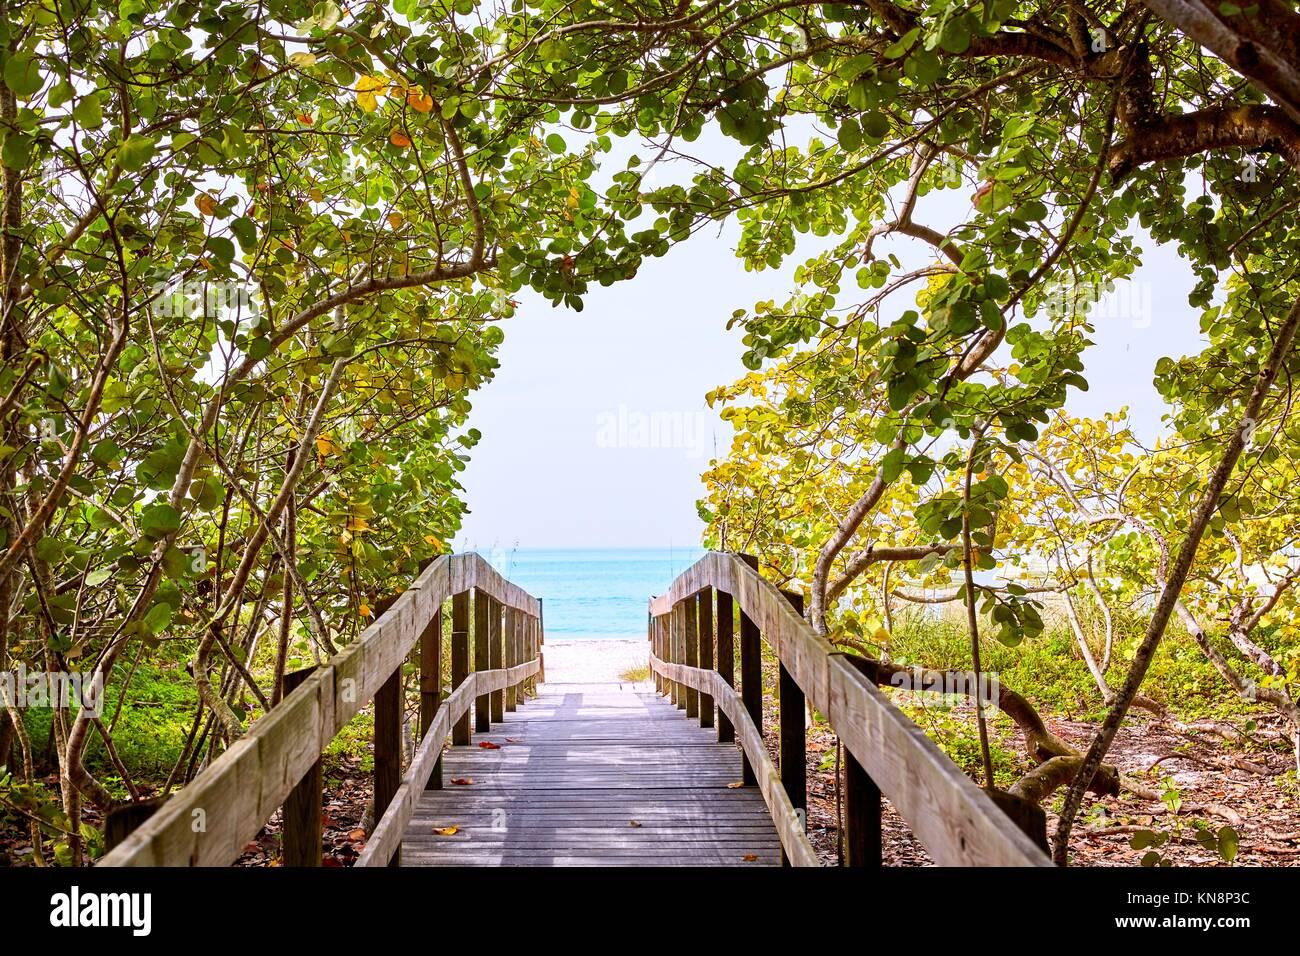 Florida Bahía bonita Barefoot Beach Walk forma EN ESTADOS UNIDOS. Imagen De Stock